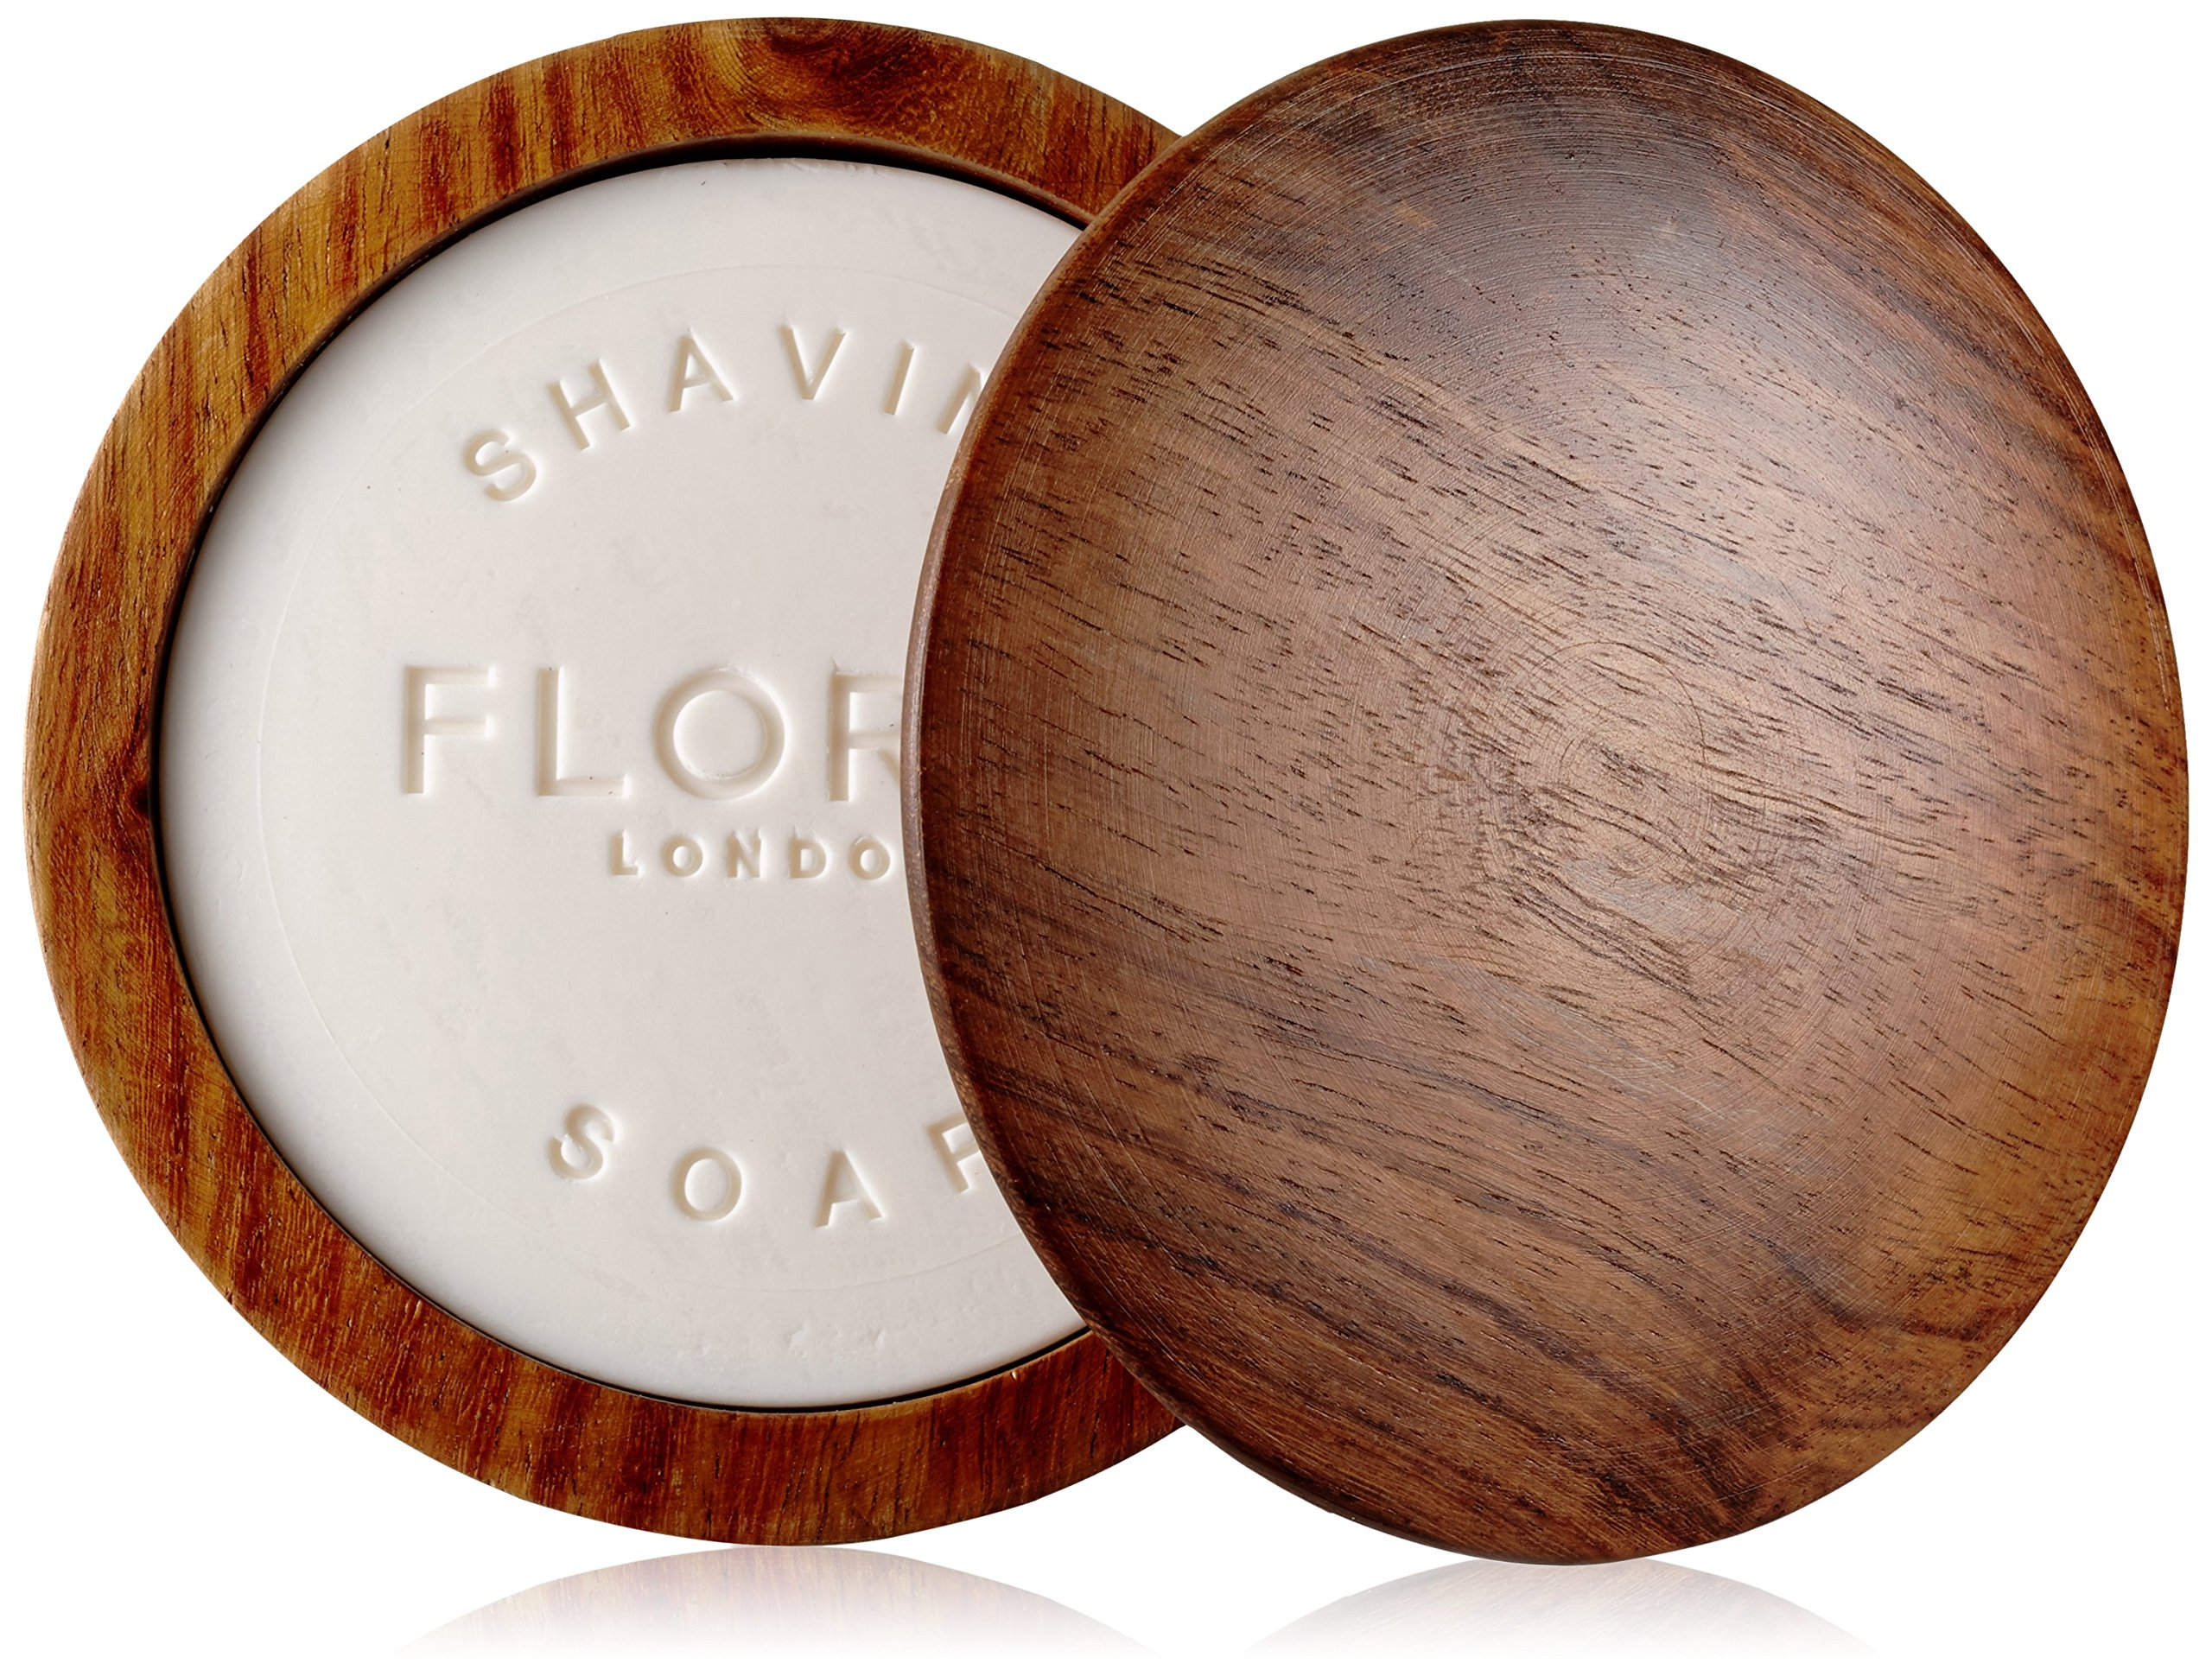 Floris London No.89 Shaving Soap in a Wooden Bowl, 3.4 Ounce